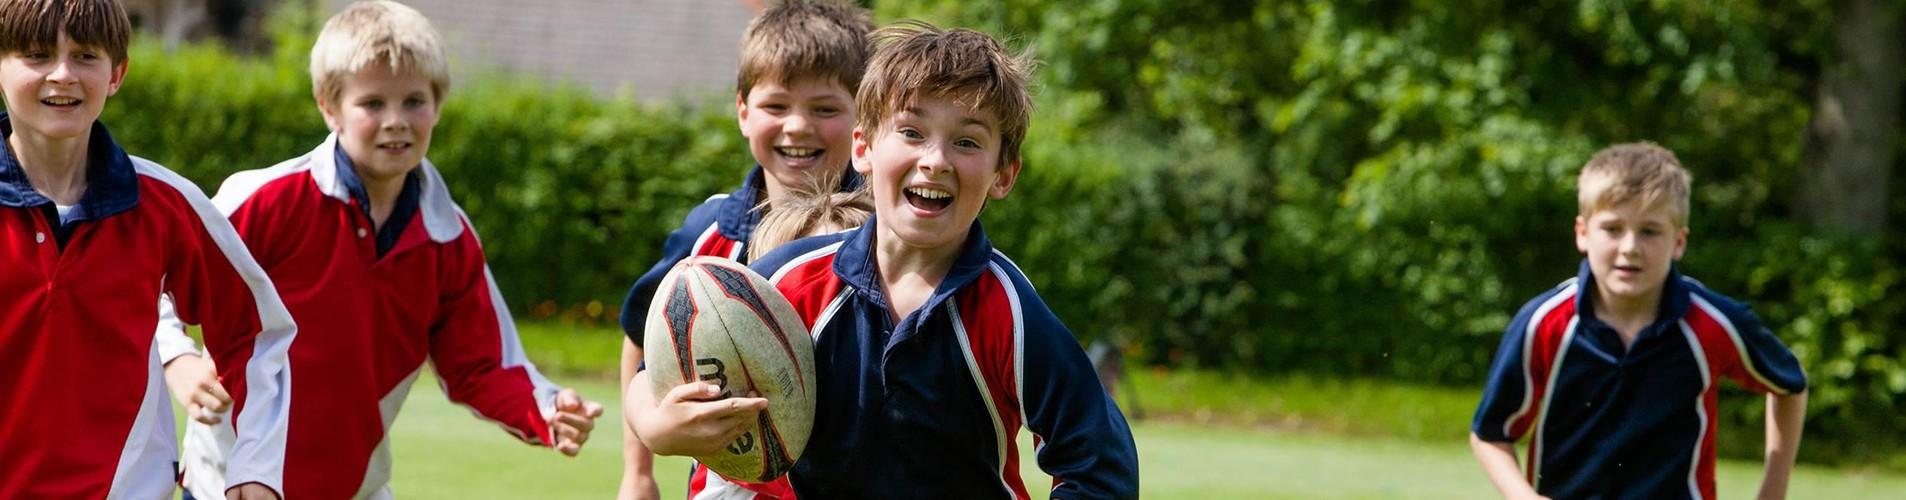 highfield-school-life-sport-main